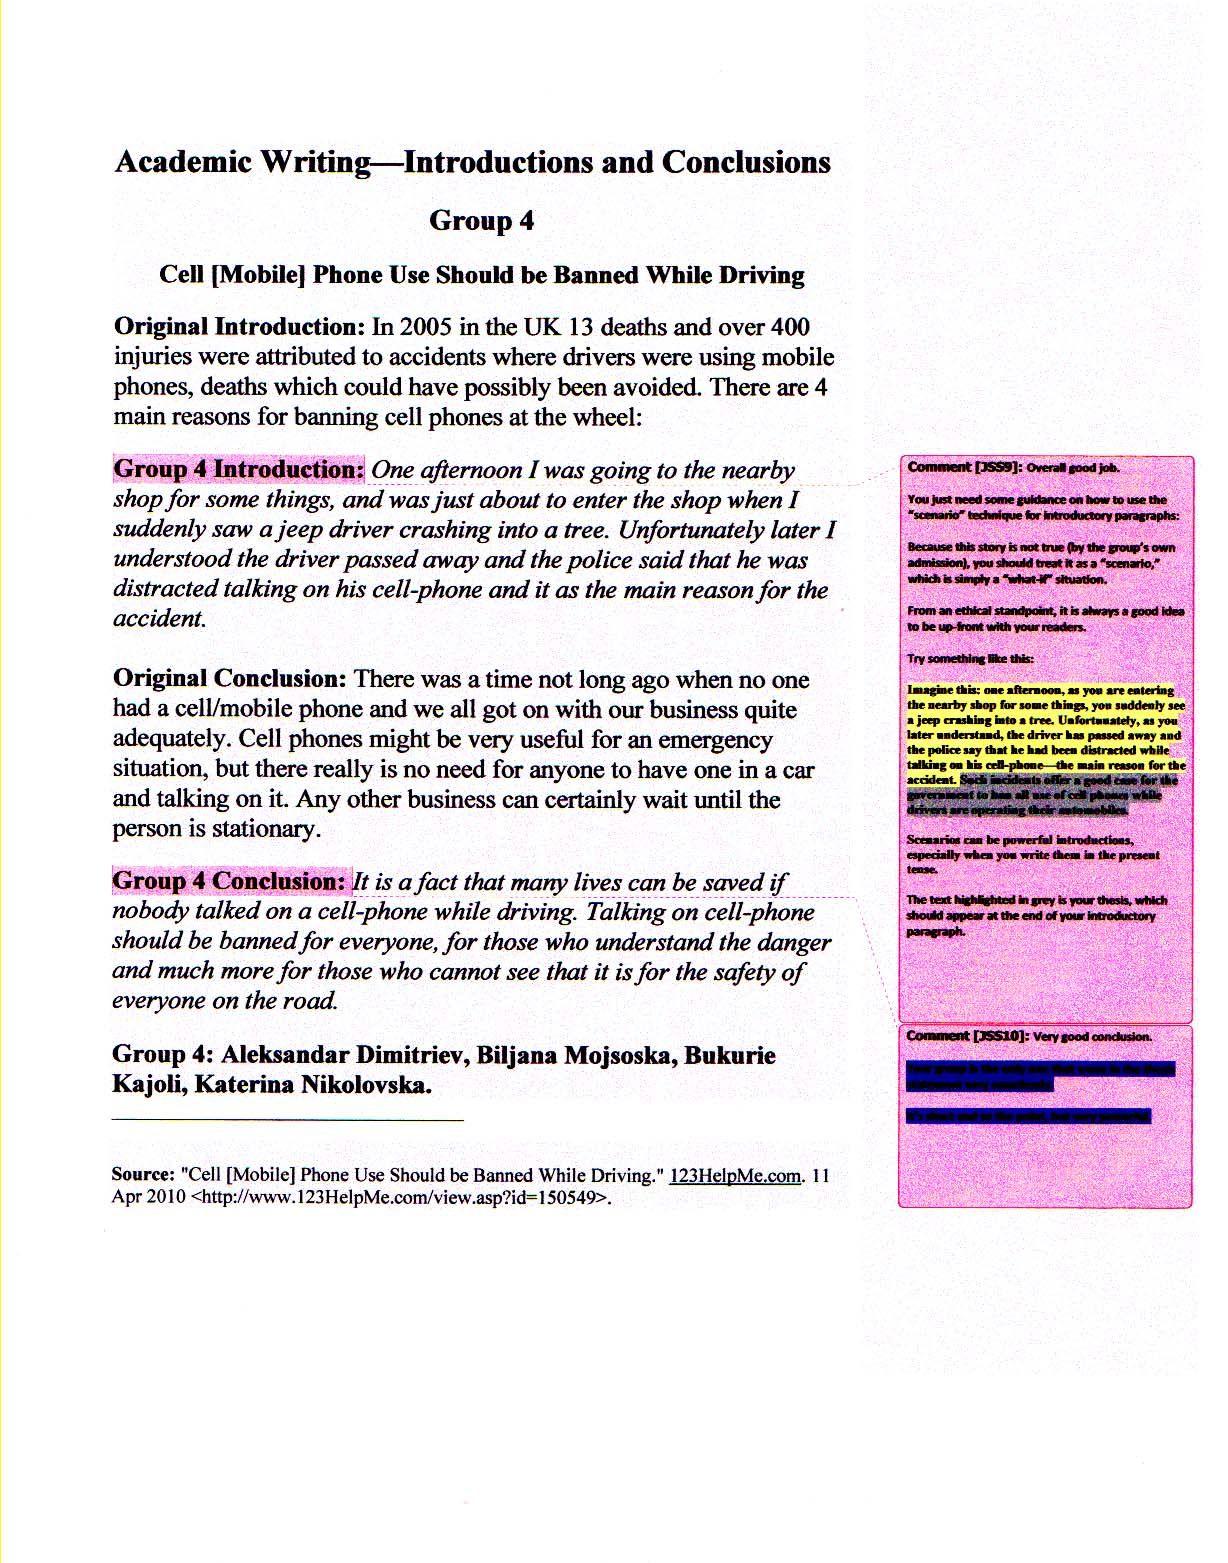 006 Persuasive Essay Conclusion Impressive Paragraph Examples Structure Full